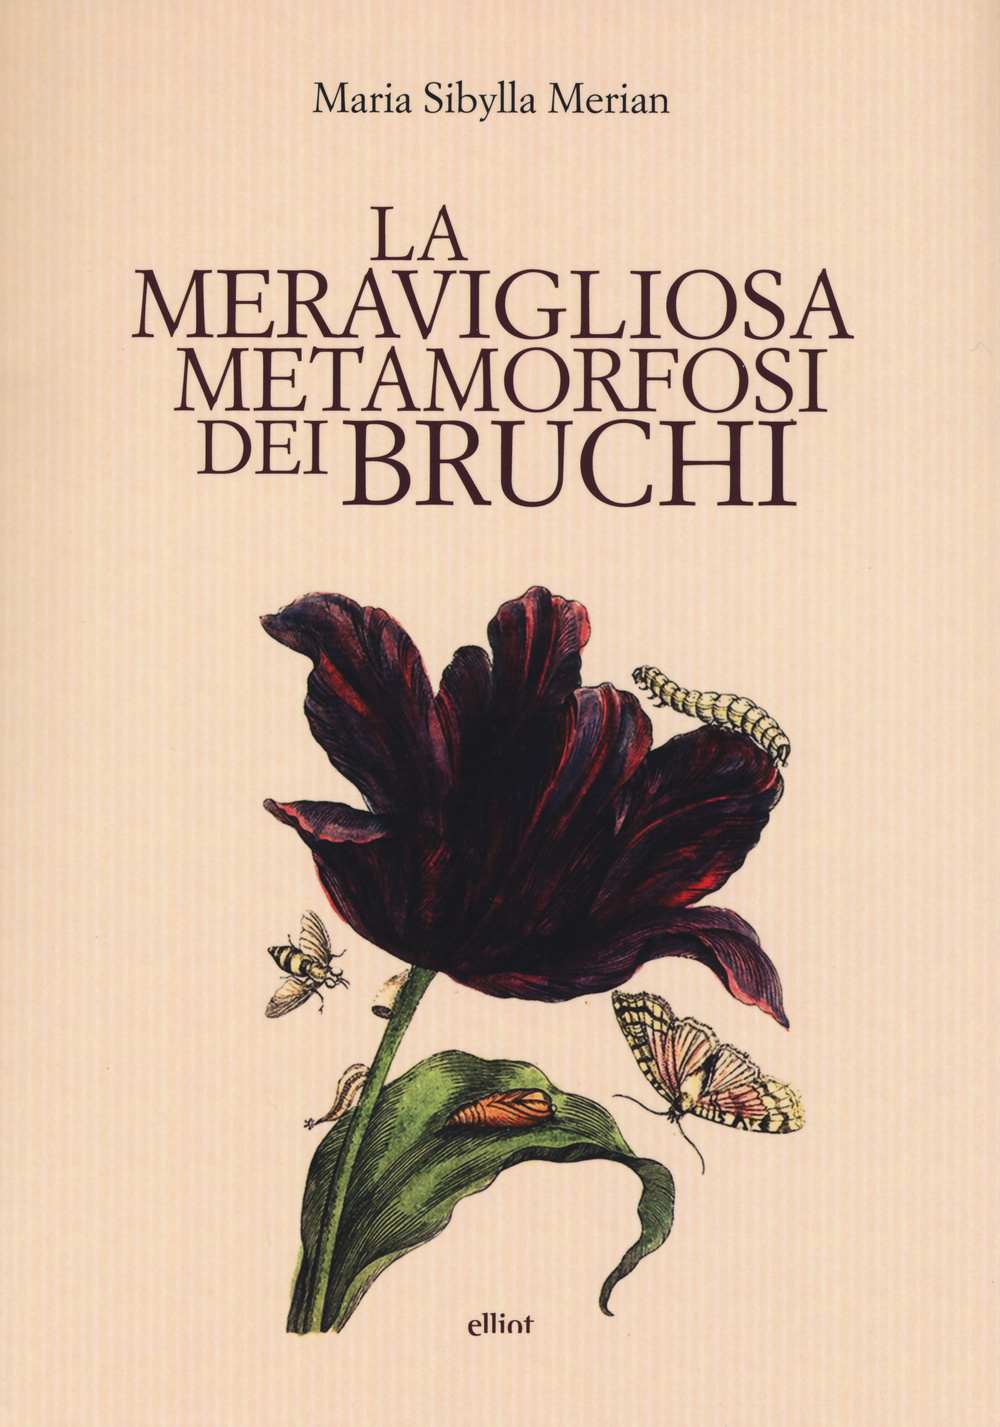 MERAVIGLIOSA METAMORFOSI DEI BRUCHI (LA) - Merian M. Sibylla; Gregorio M. (cur.) - 9788861929548